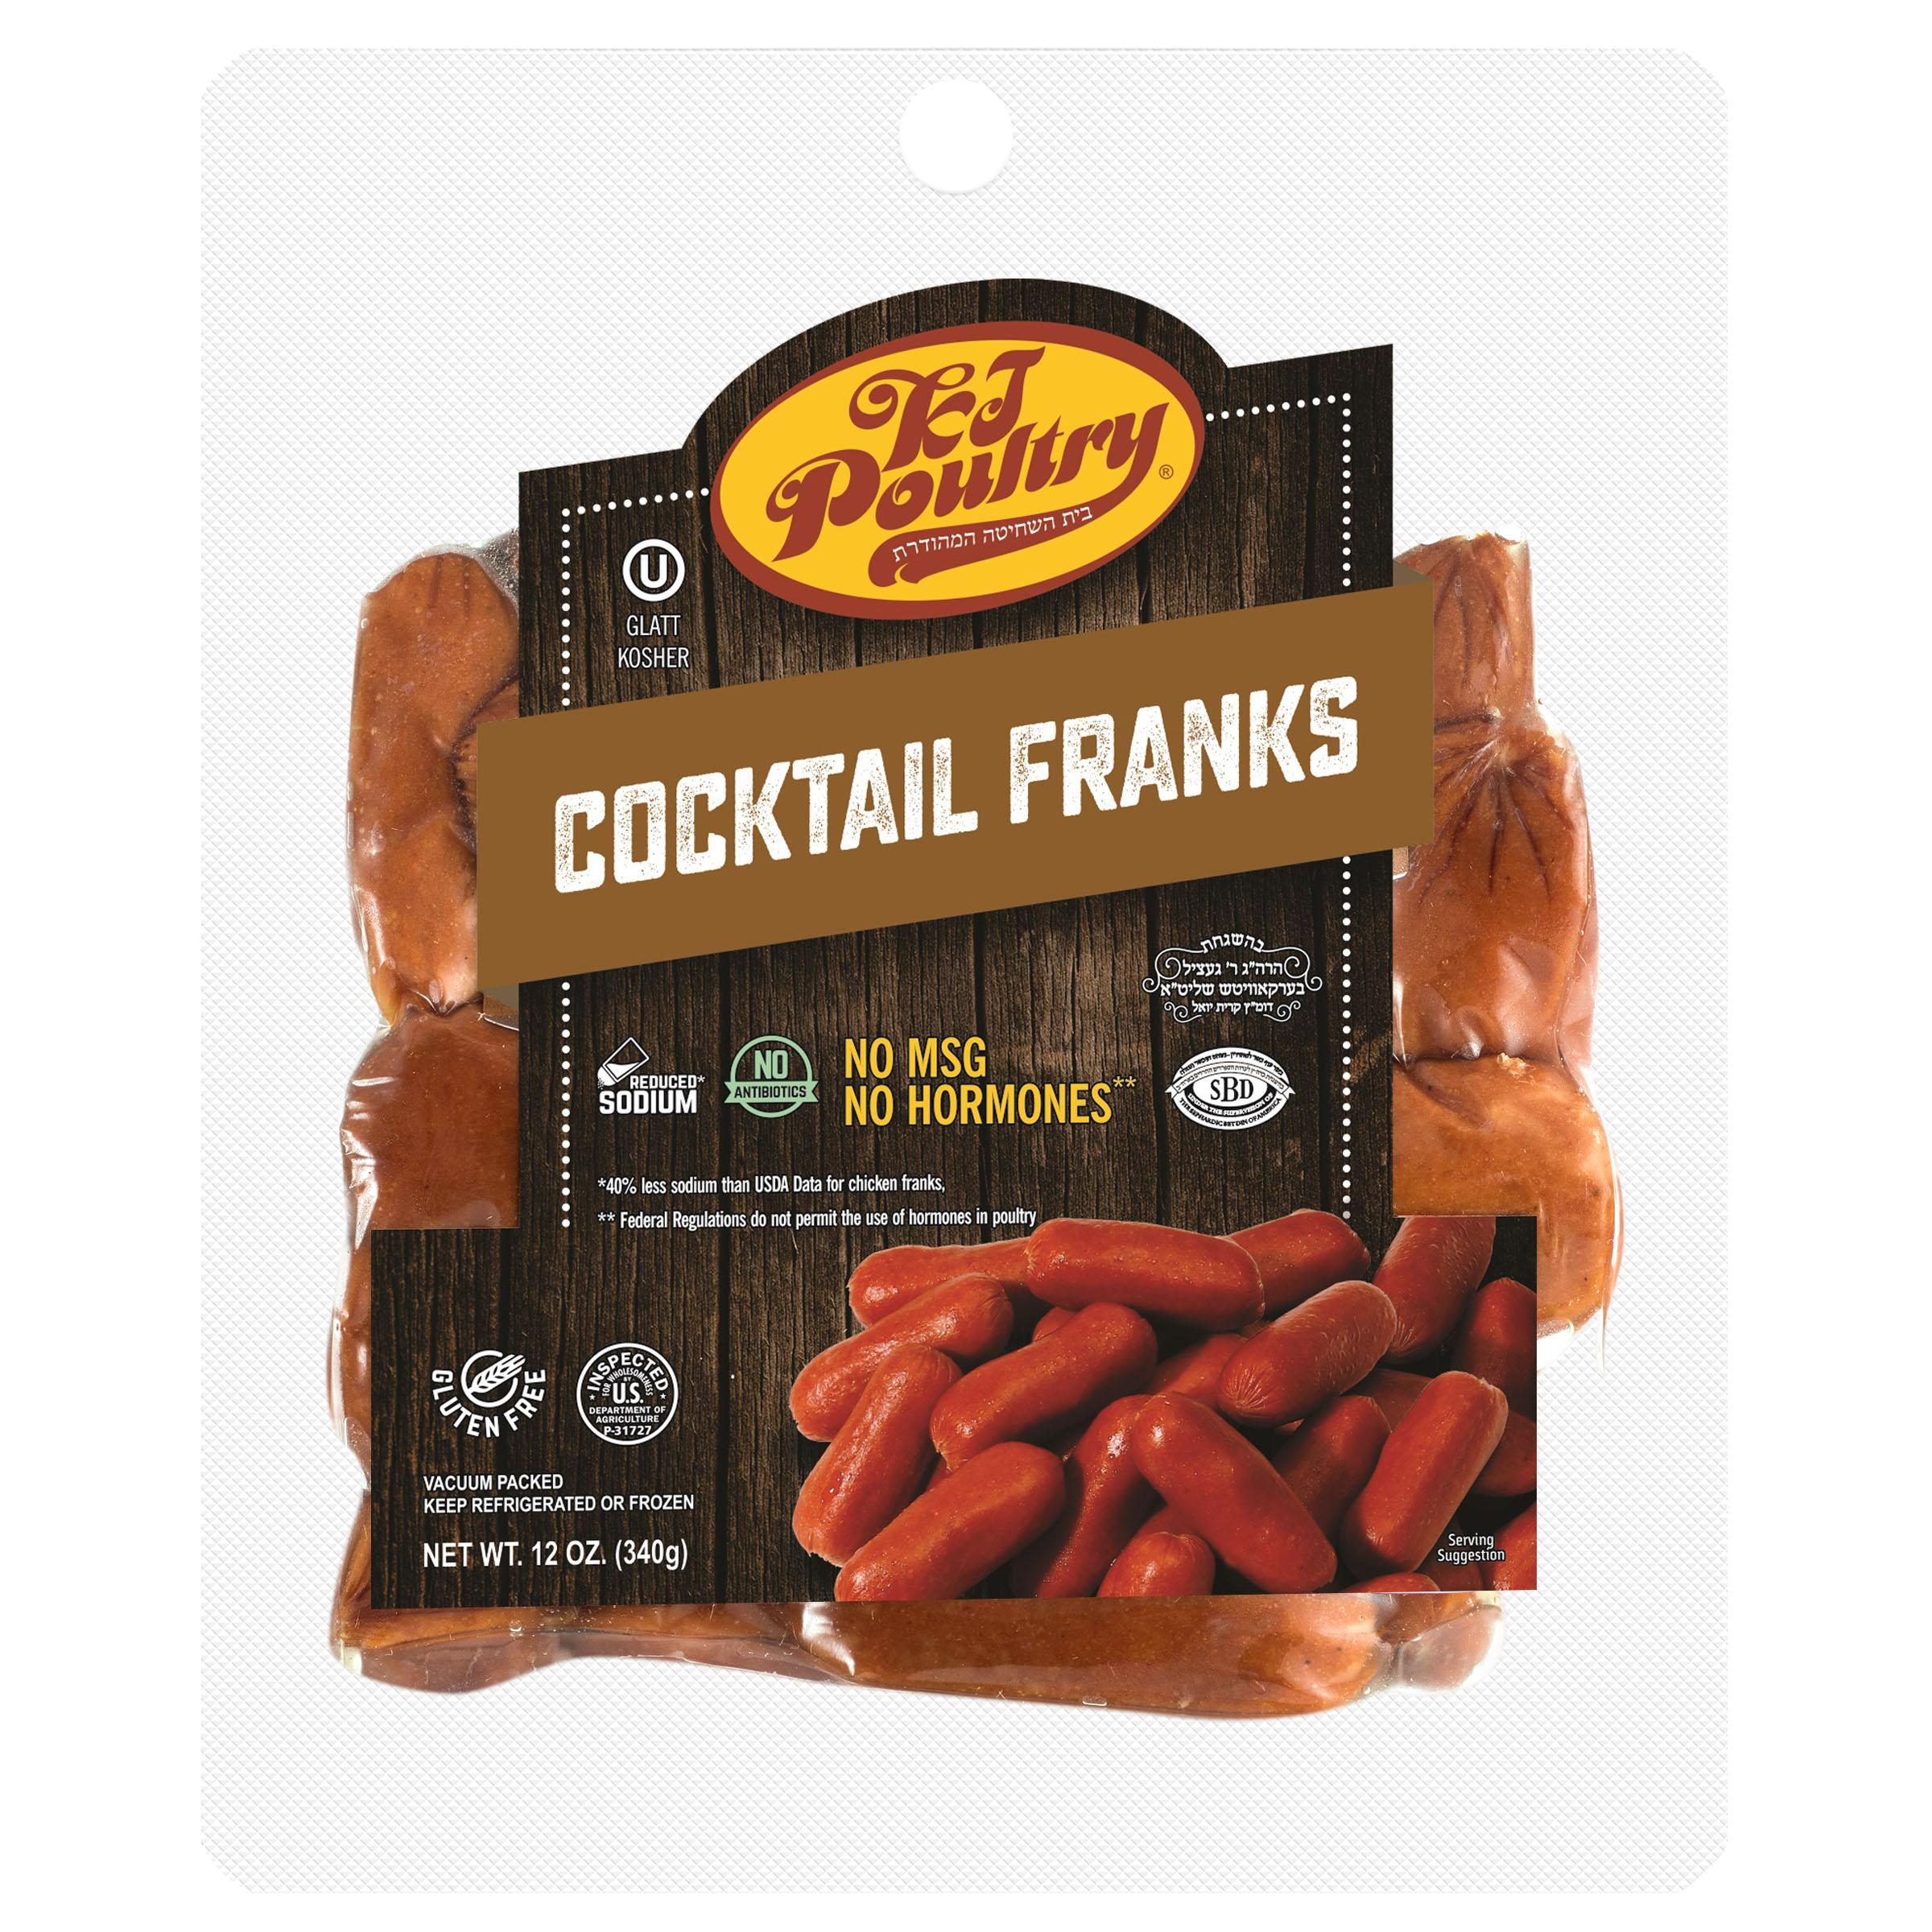 Fud Turkey Franks - Shop Hot Dogs at H-E-B